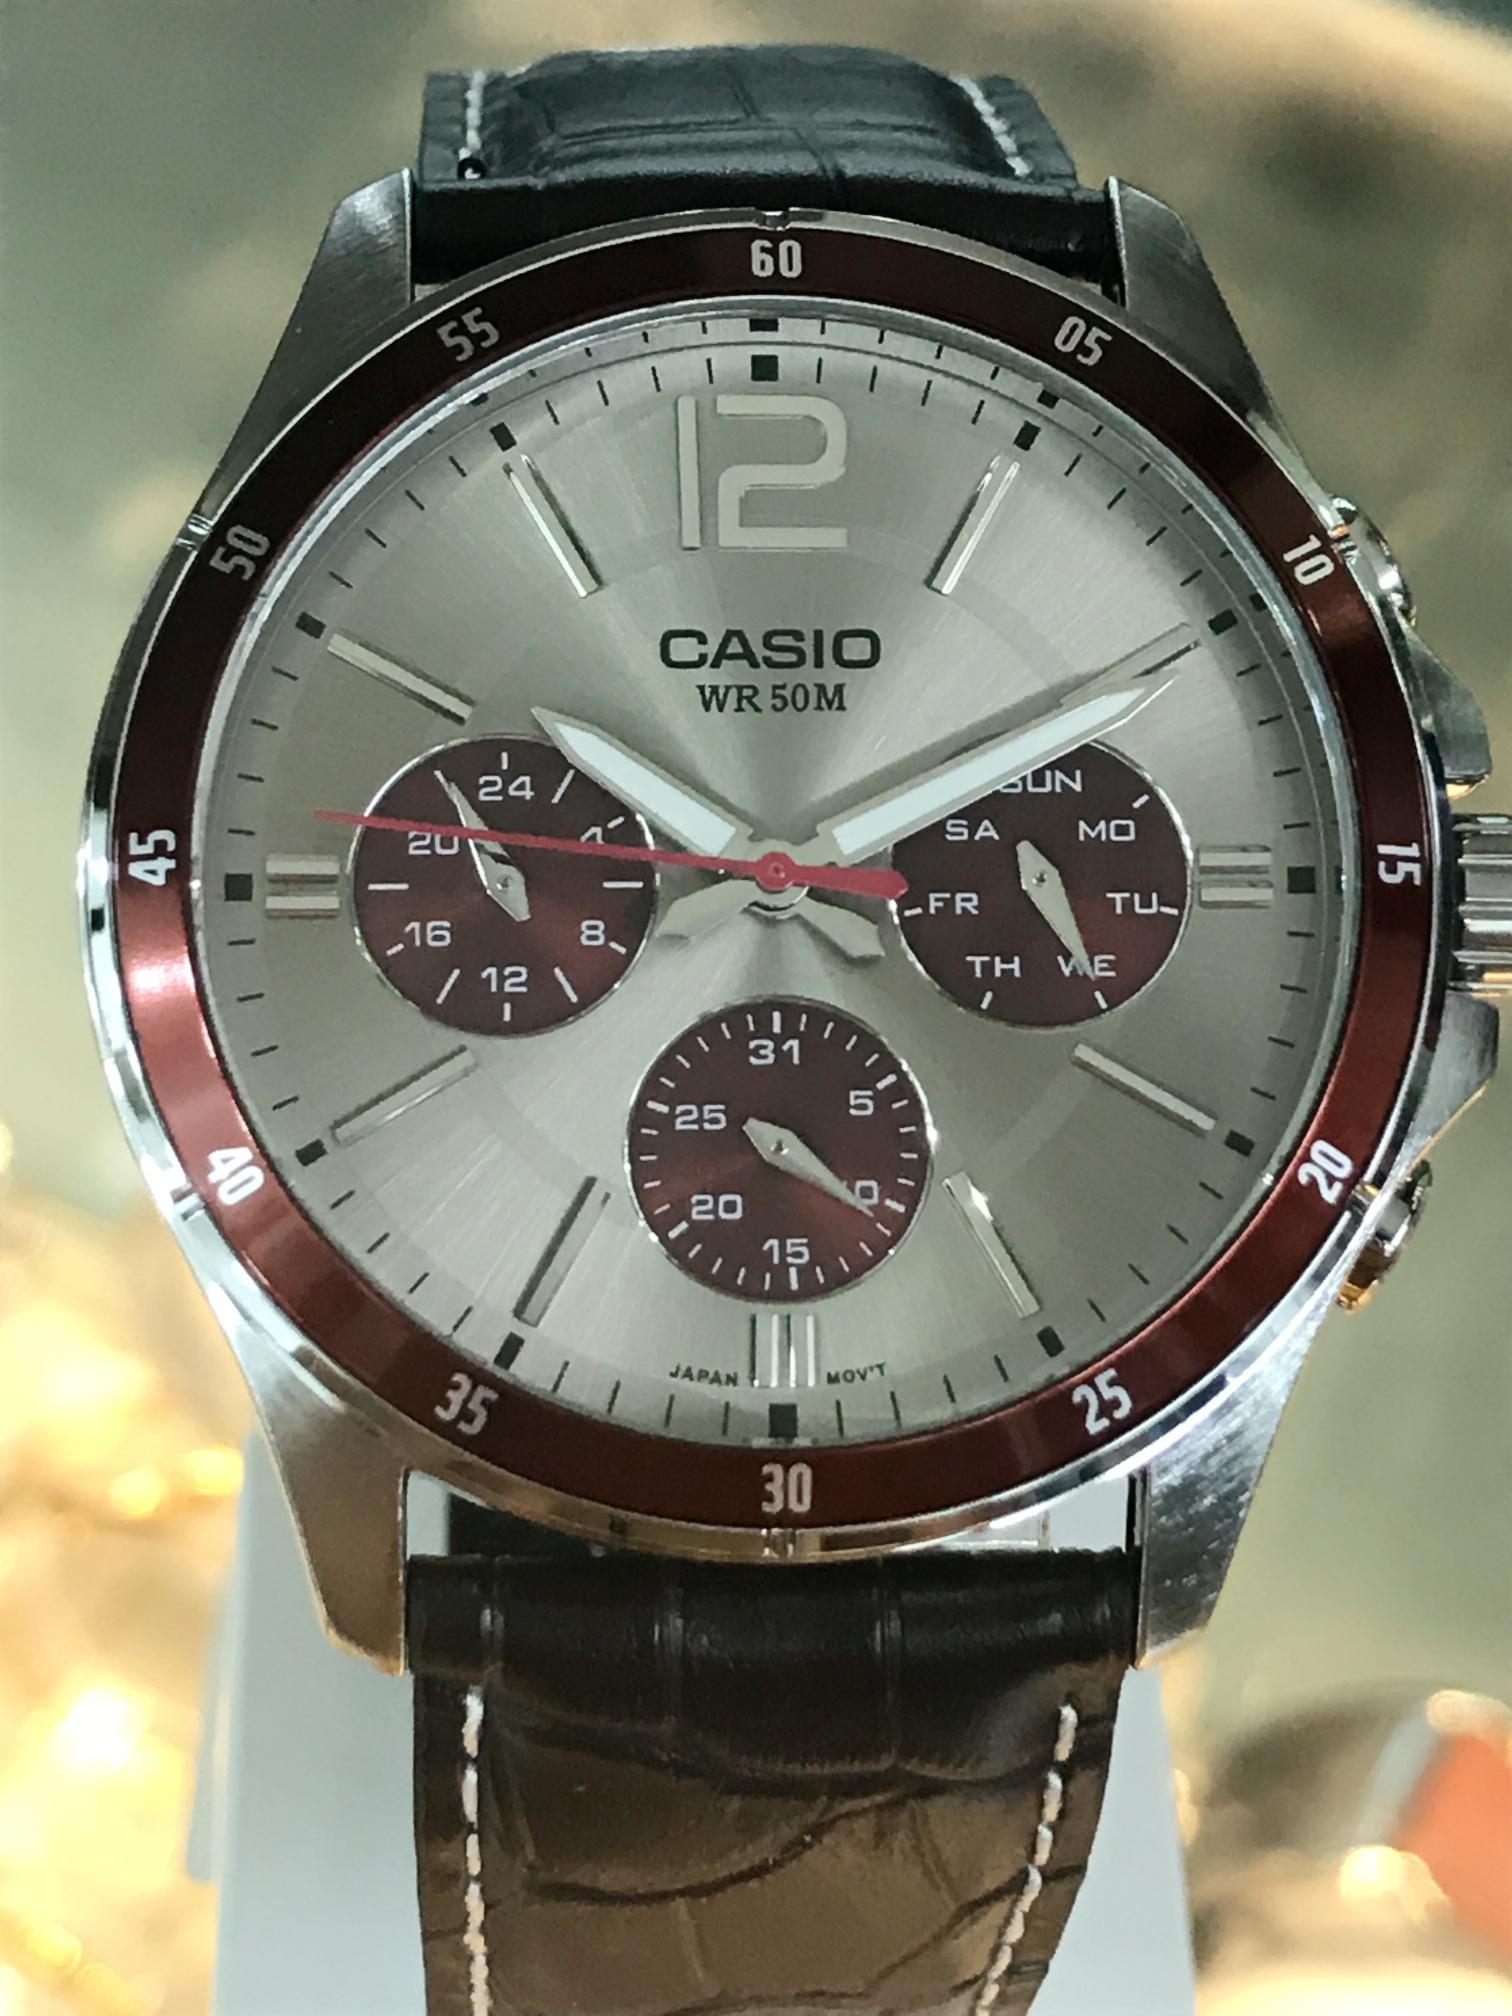 ĐỒNG HỒ CASIO MTP - 1374L - 7A1VDF